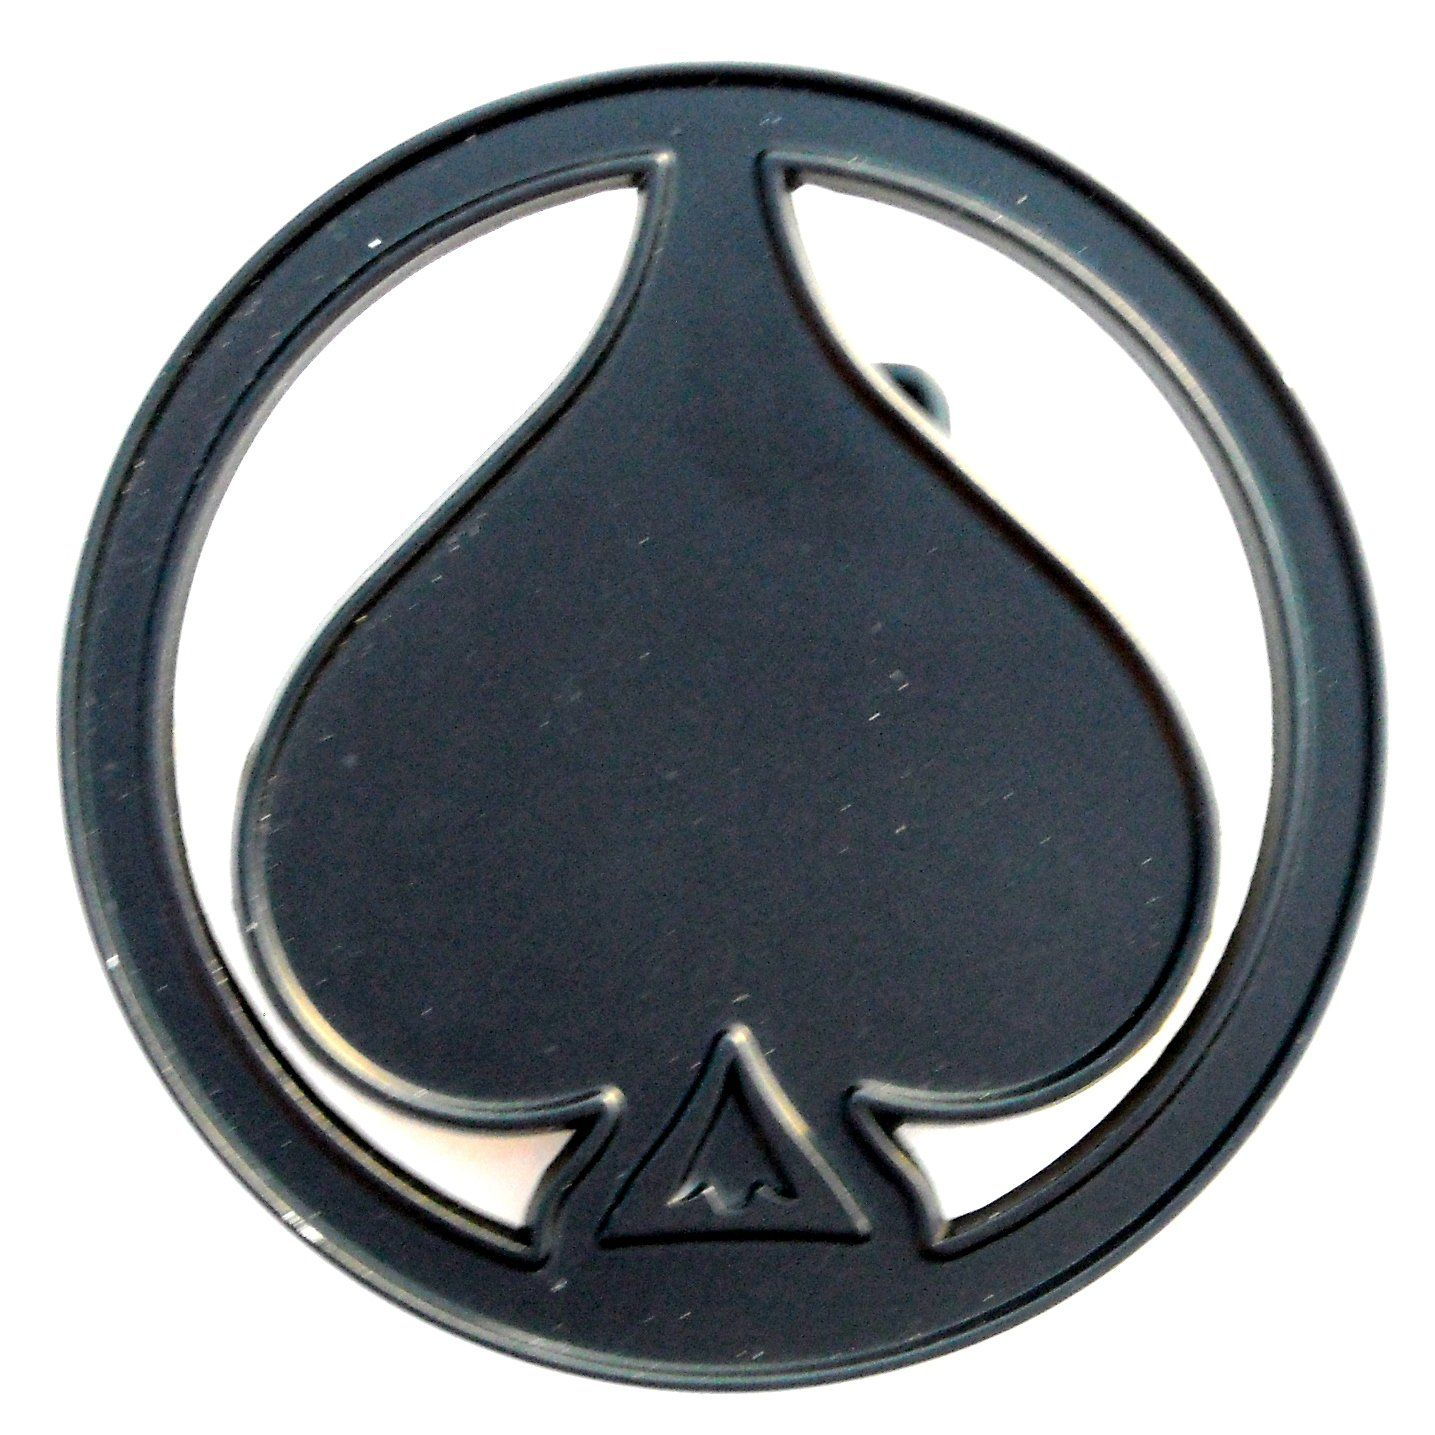 Black ace of spades symbol round metal nos belt buckle ecommerce black ace of spades symbol round metal nos belt buckle biocorpaavc Choice Image